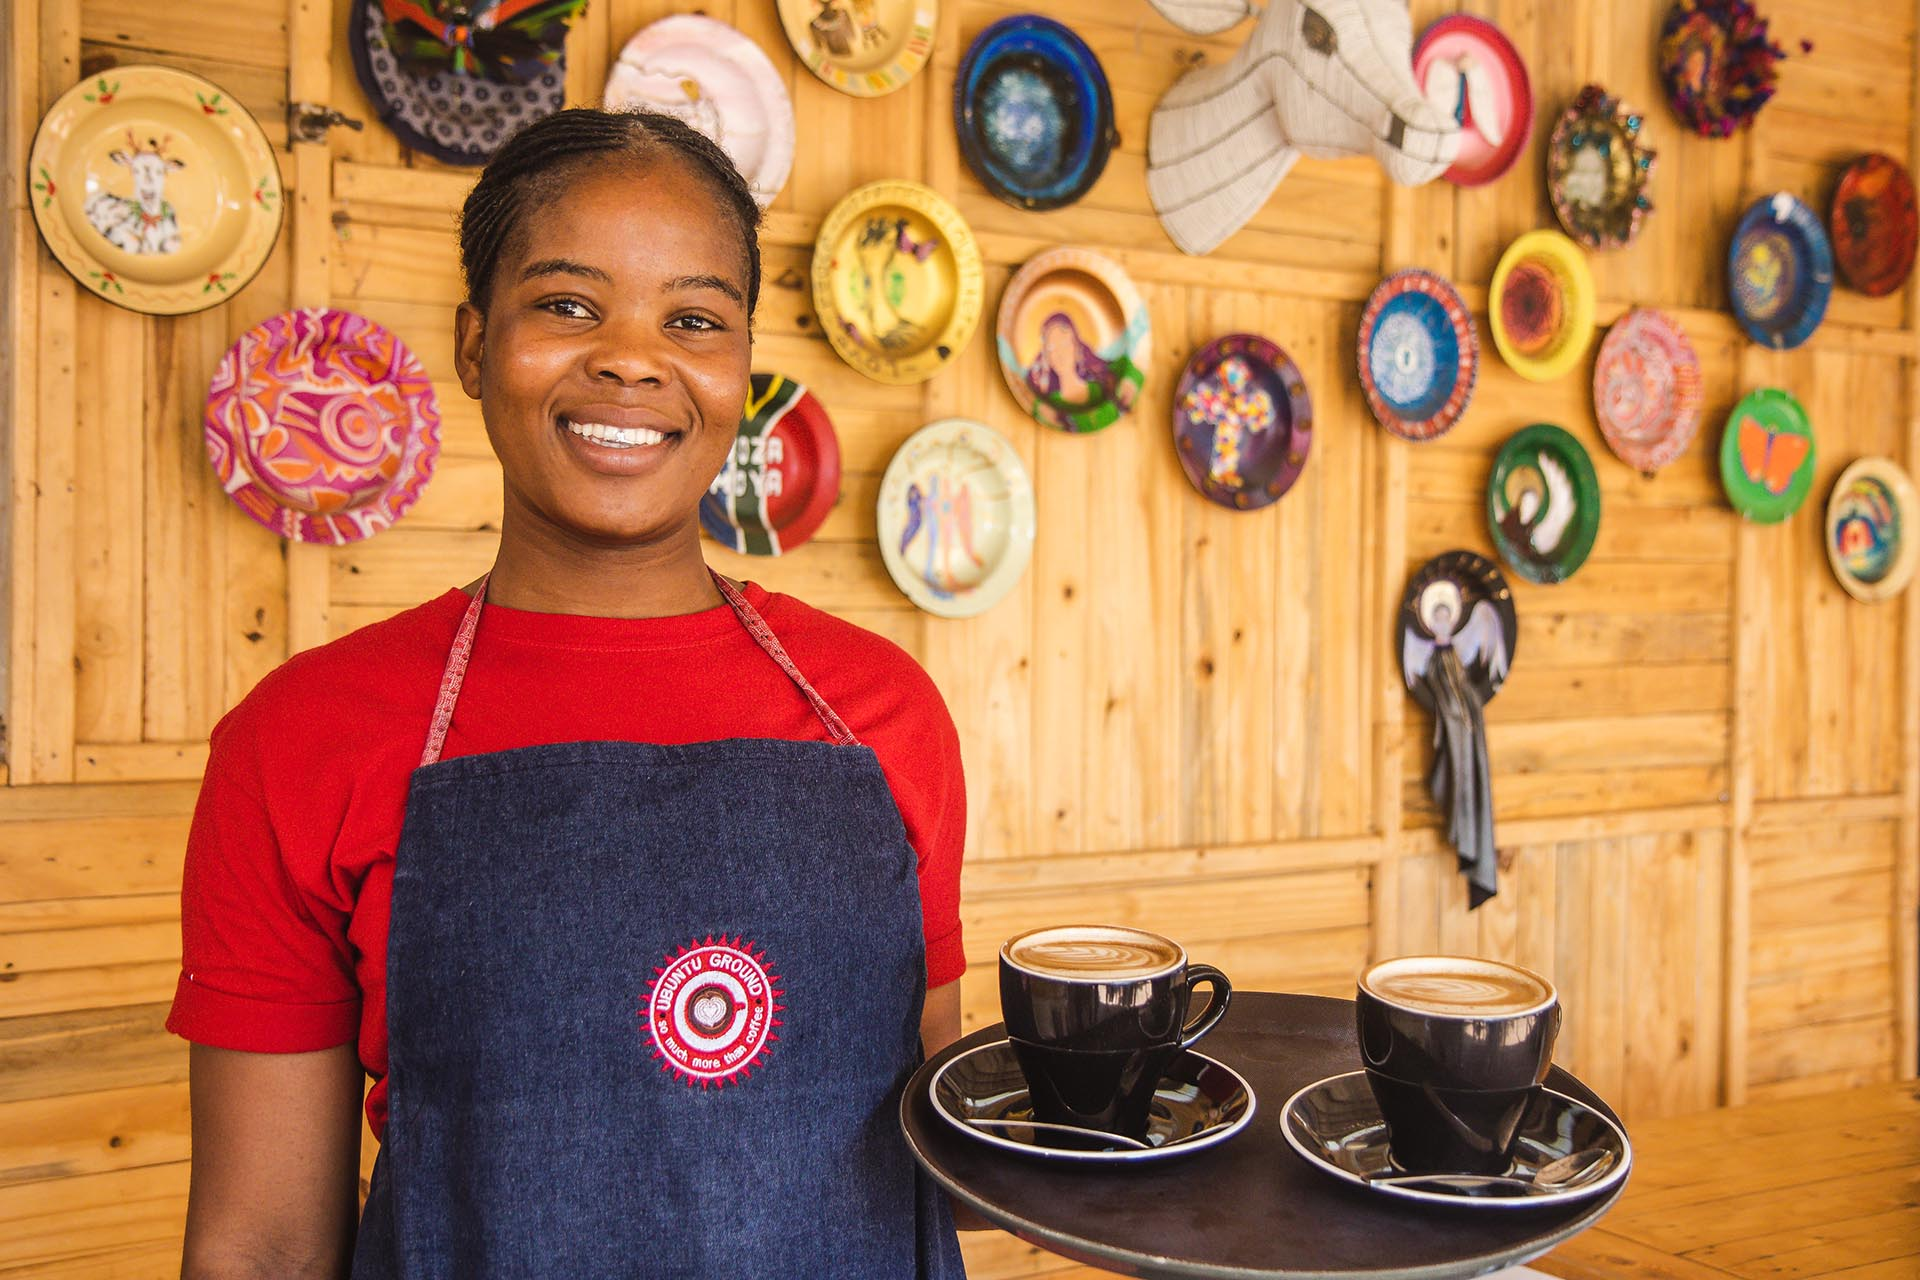 ubuntu ground cafe - hact-biz-hillaids-Hillcrest-AIDS-Centre-Trust-KZN-ZA